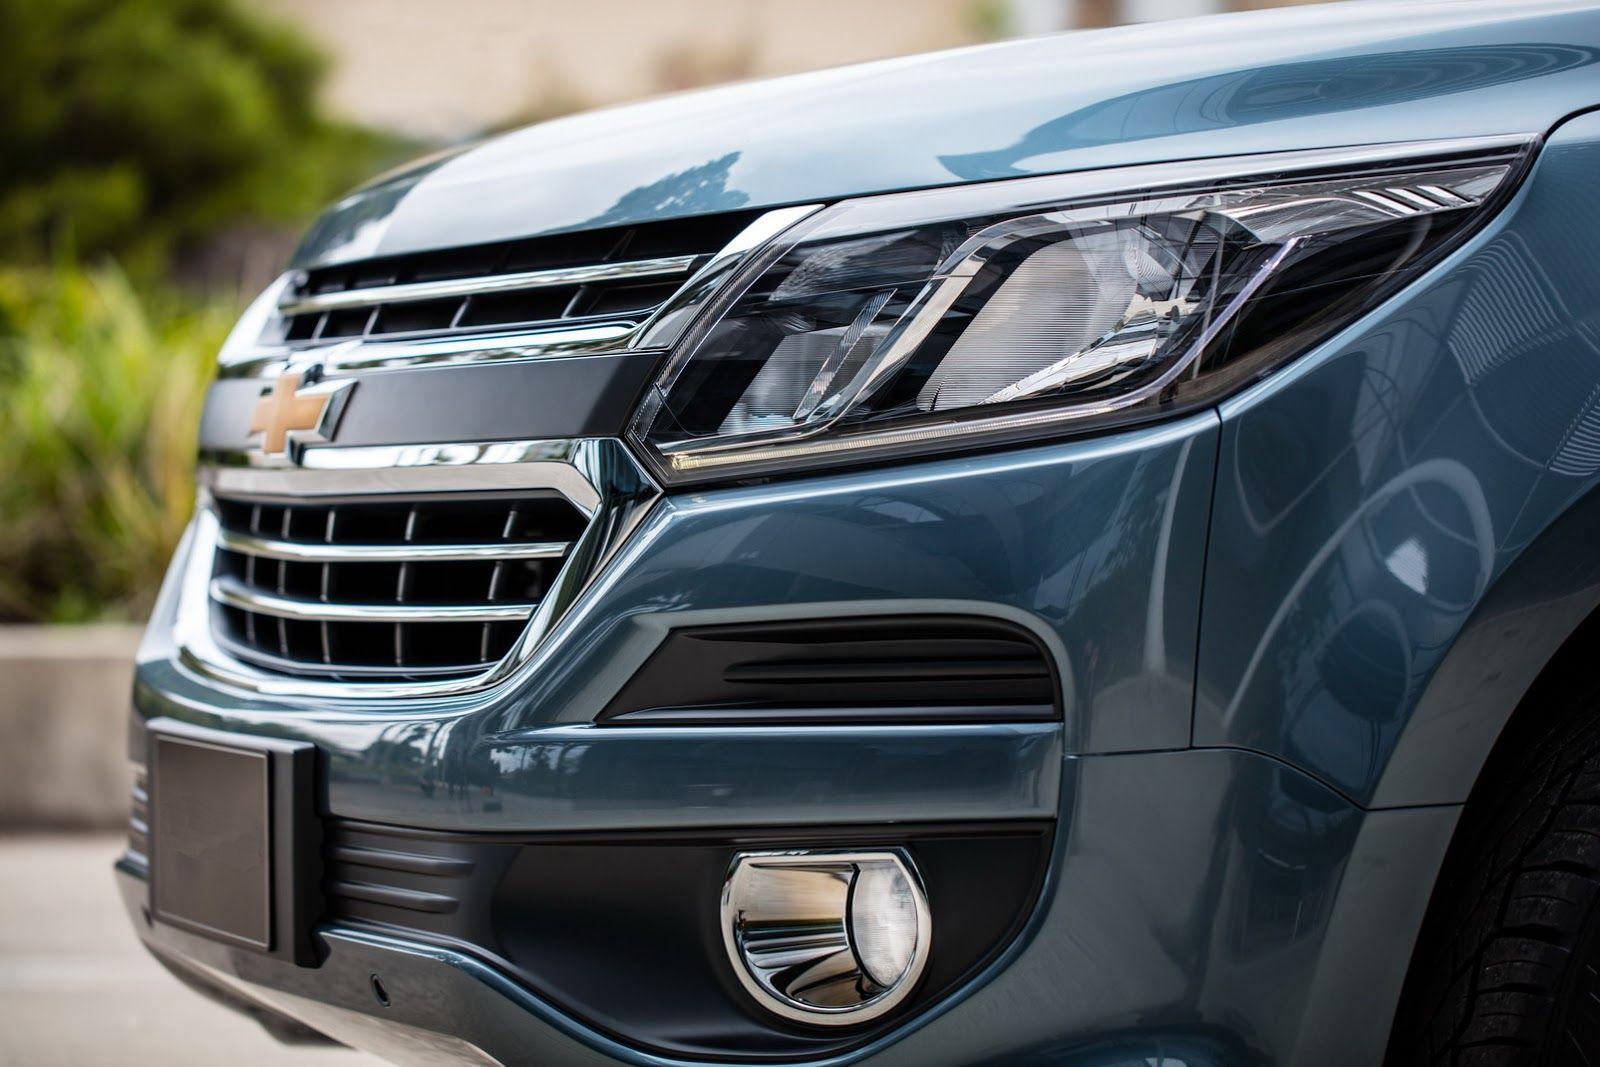 2017 Chevrolet Trailblazer Price, Review, Pictures, Colors ...